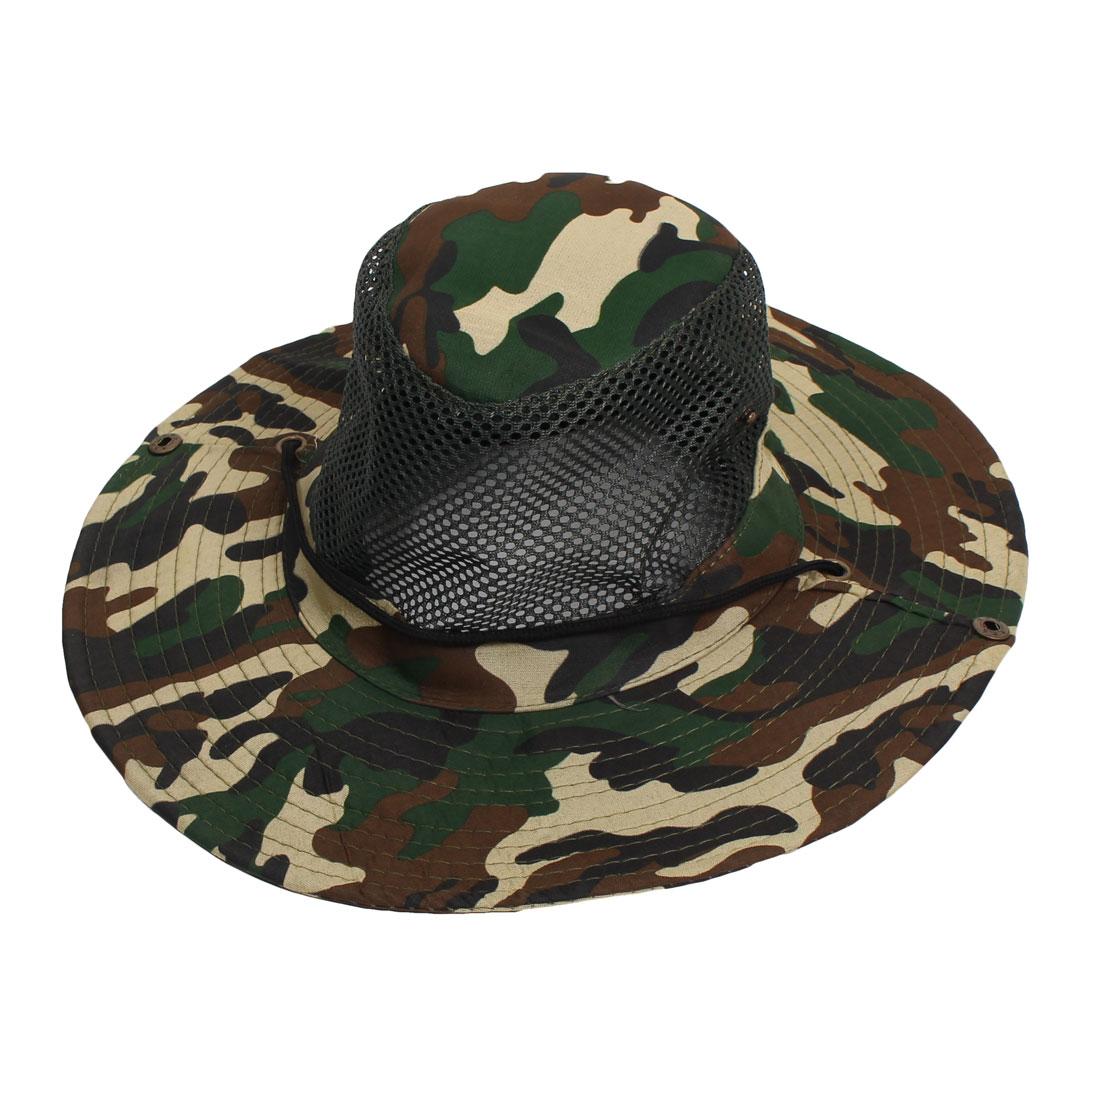 Unisex Green Mesh Design Sunbonnet Camouflage Fishing Hat Cap